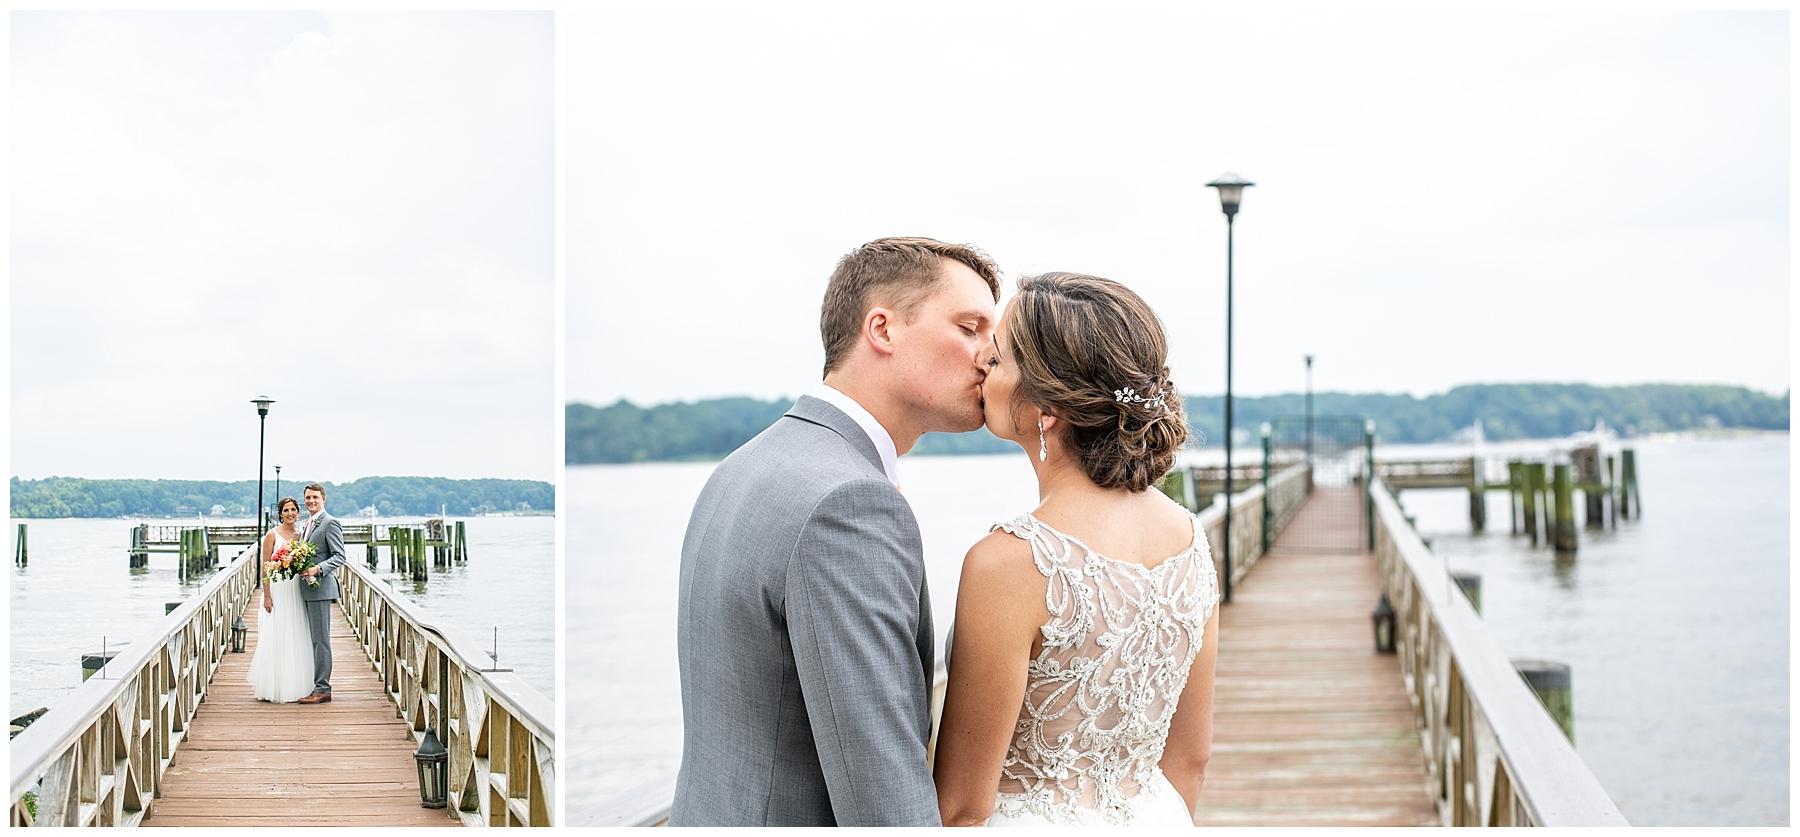 Bohemia River Overlook Wedding | Baltimore Best Wedding Photographers | Baltimore Weddings | Pink Bridesmaids Dresses | Peony Bouquet